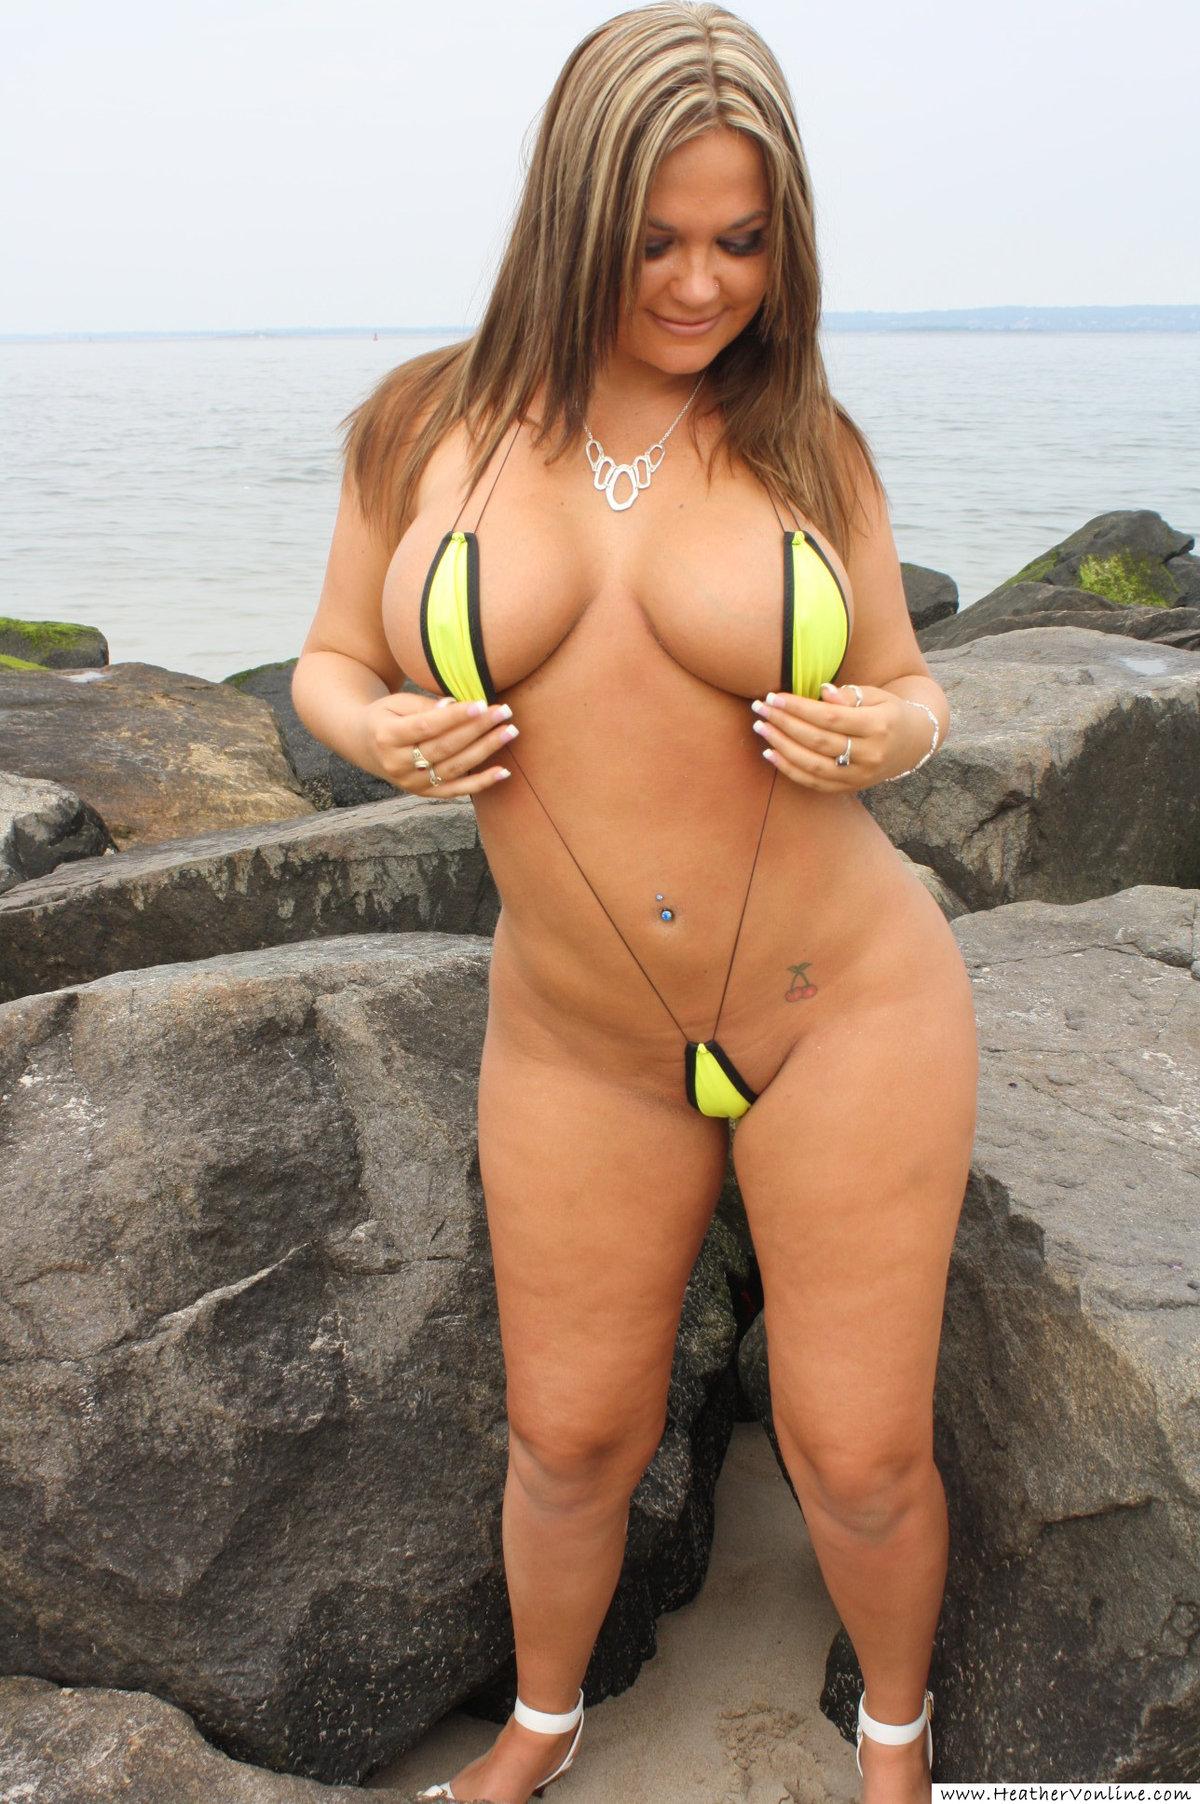 Curvy milf bikini